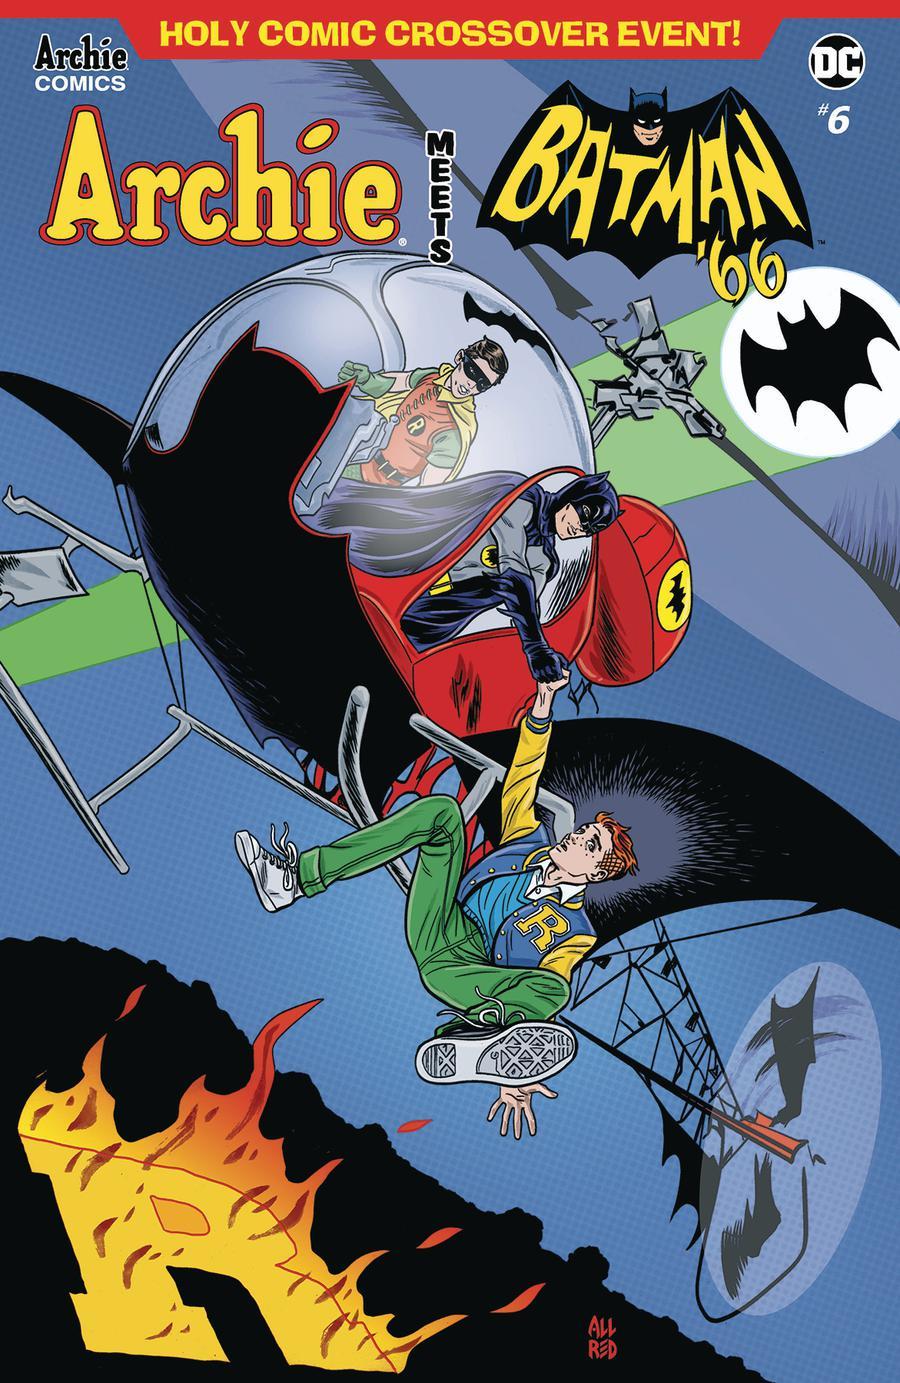 Archie Meets Batman 66 #6 Cover A Regular Michael Allred & Laura Allred Cover